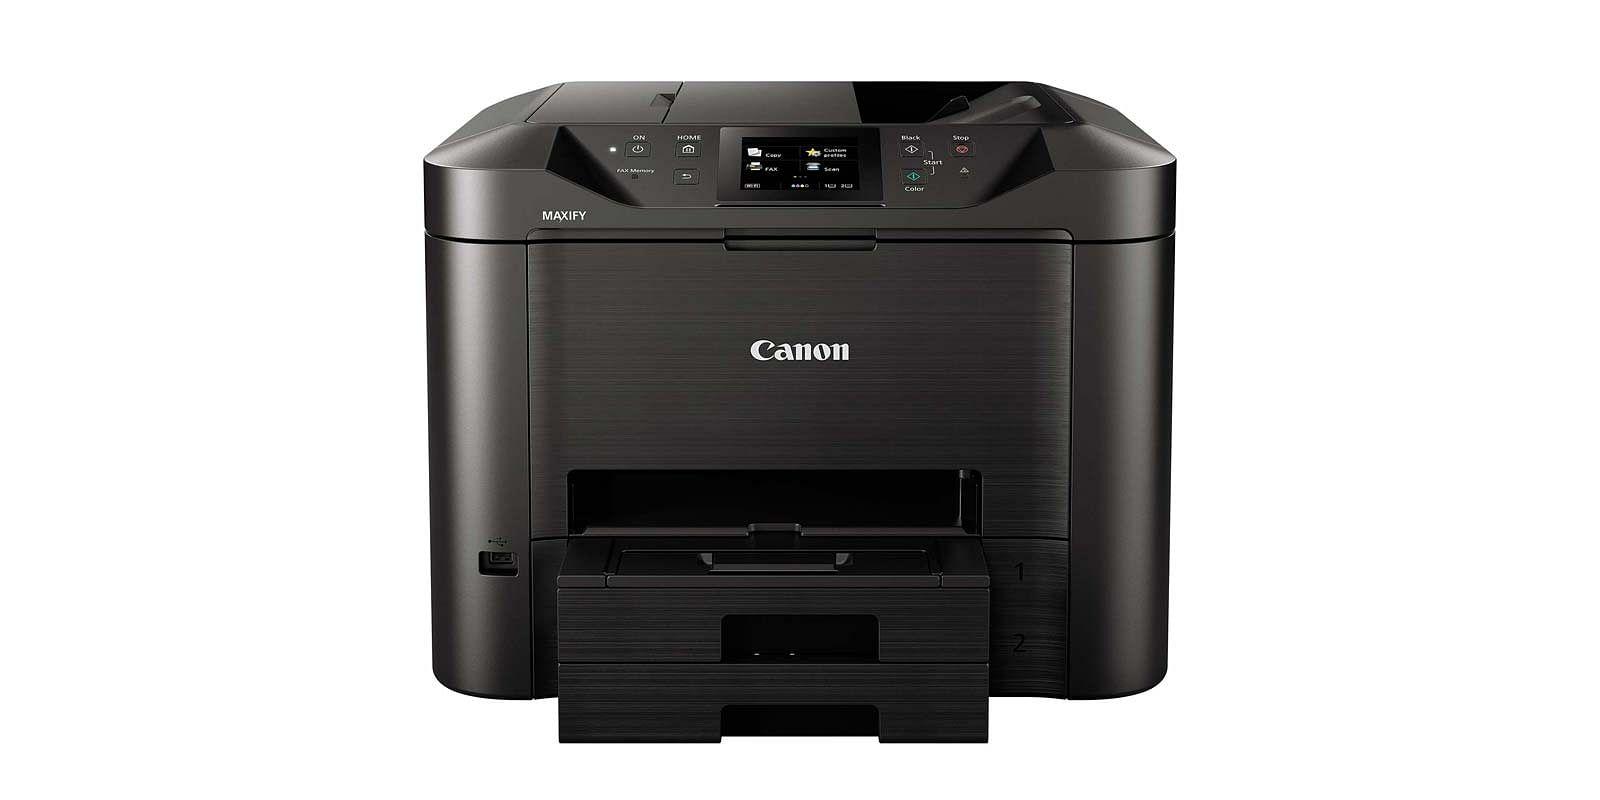 Canon MAXIFY printer